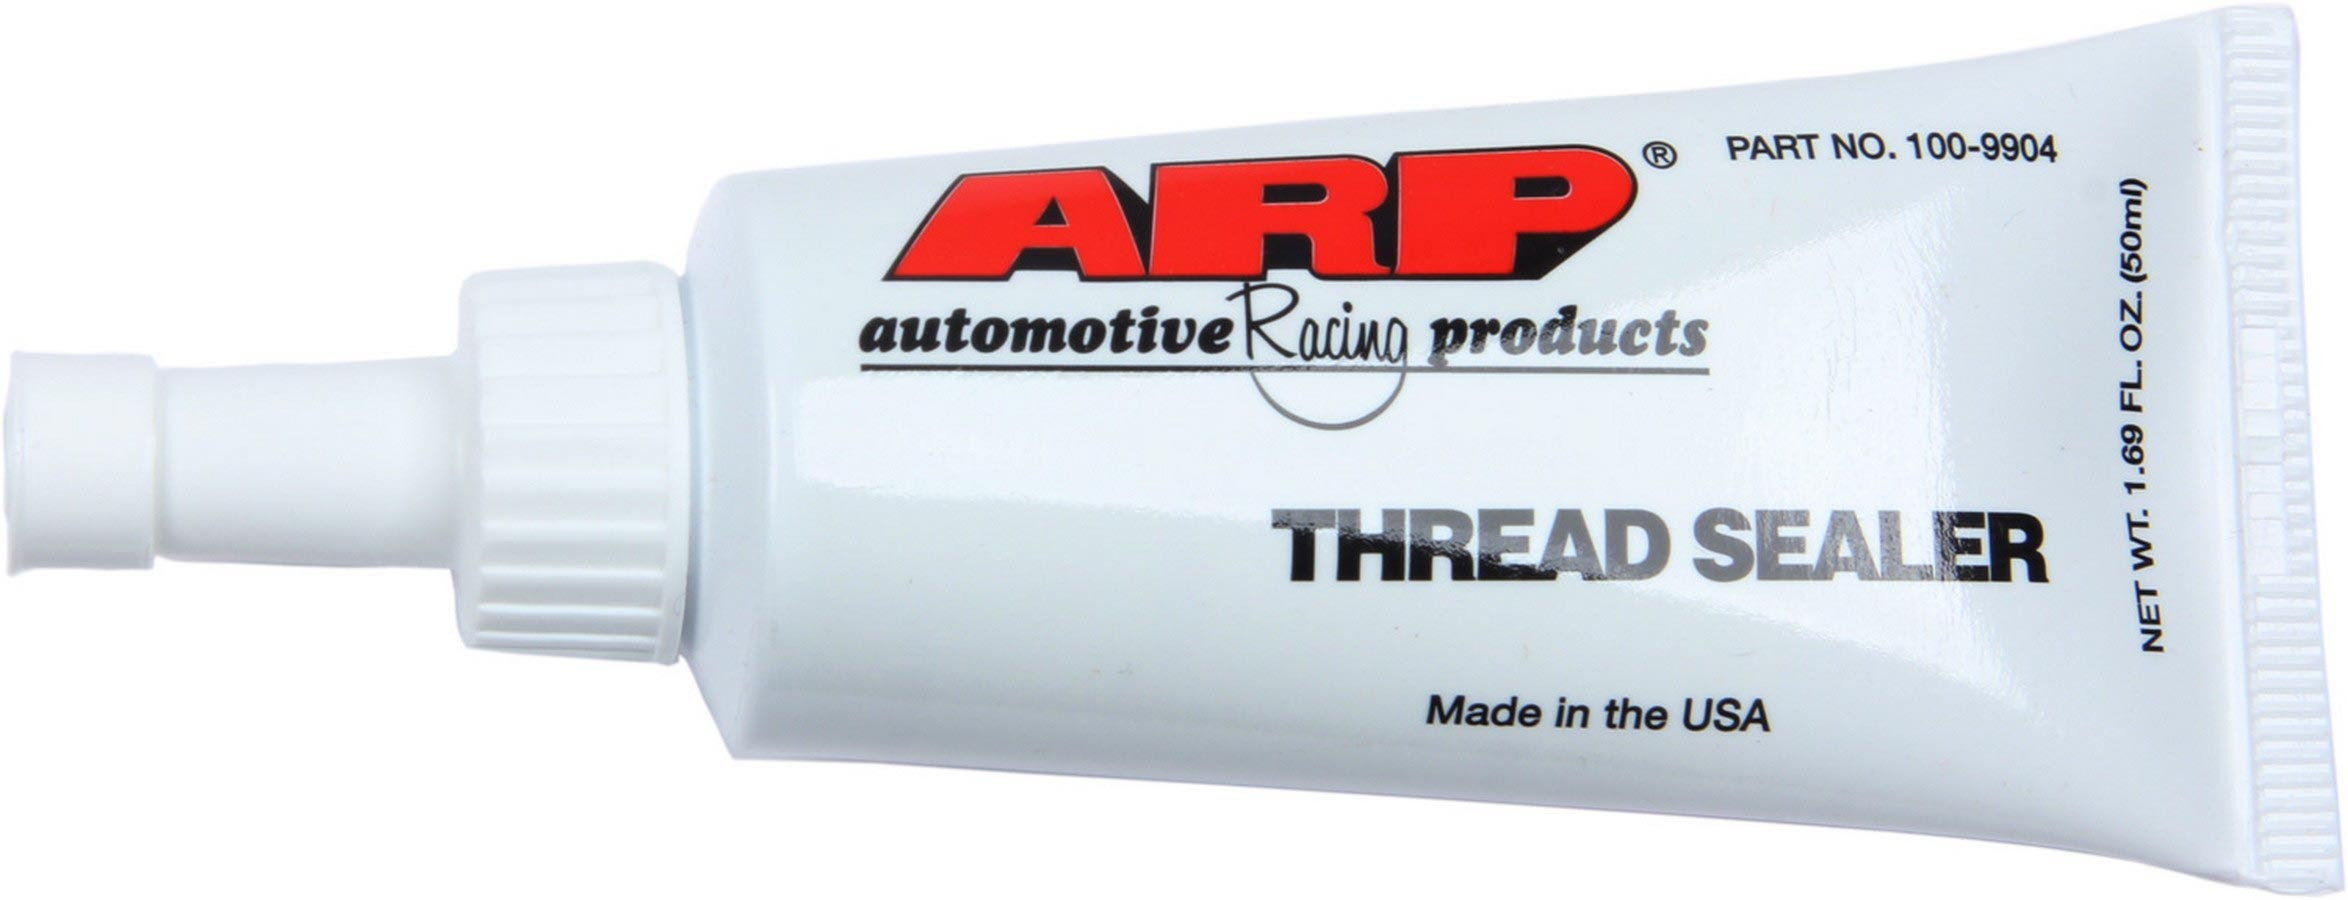 Arp PTFE Thread Sealer - 1.69oz. Tube